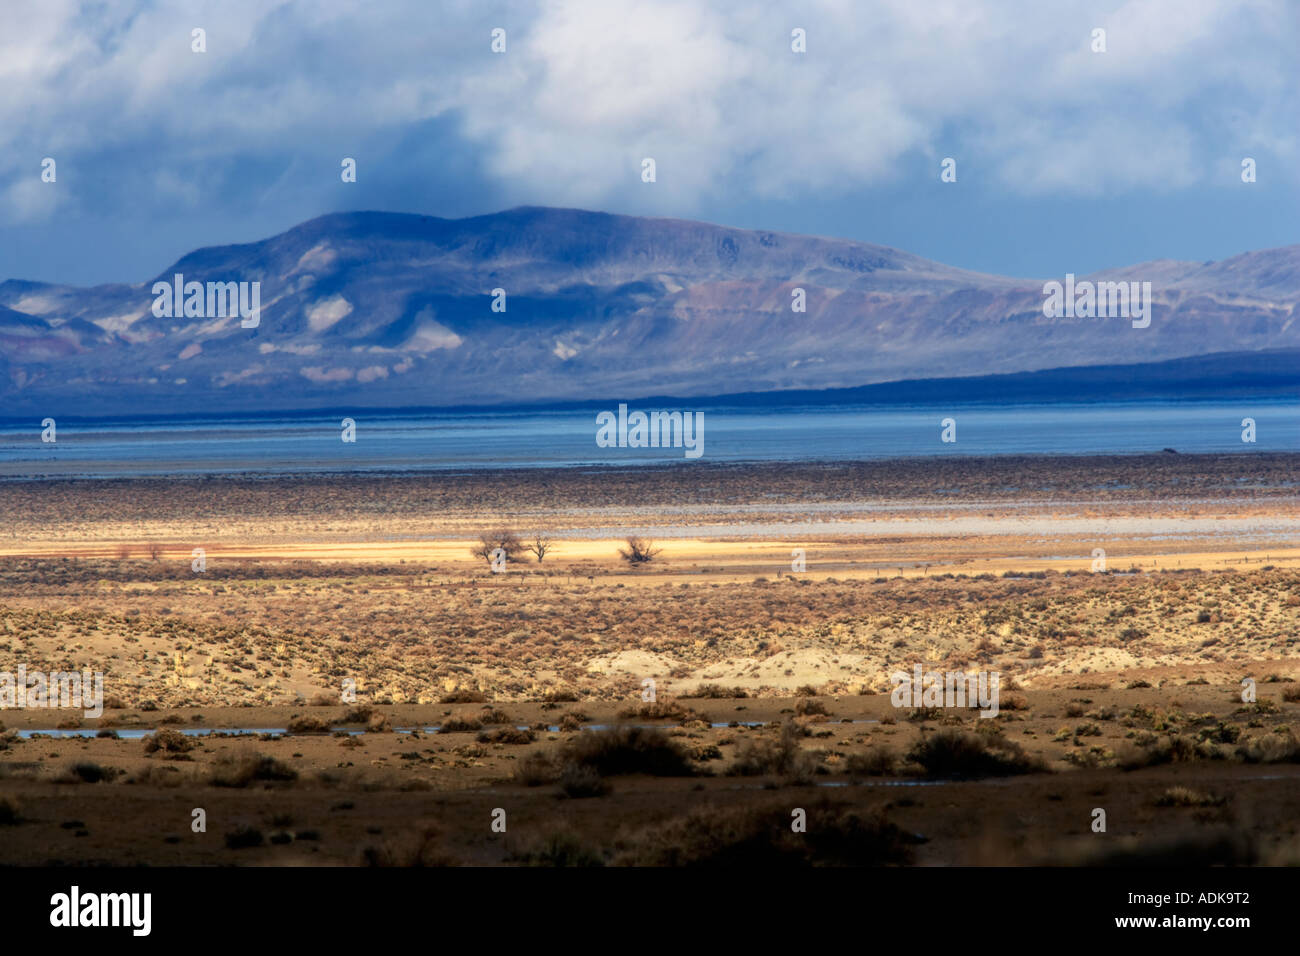 Einsame Bäume und Storm Black Rock Desert National Conservation Area Nevada Stockbild